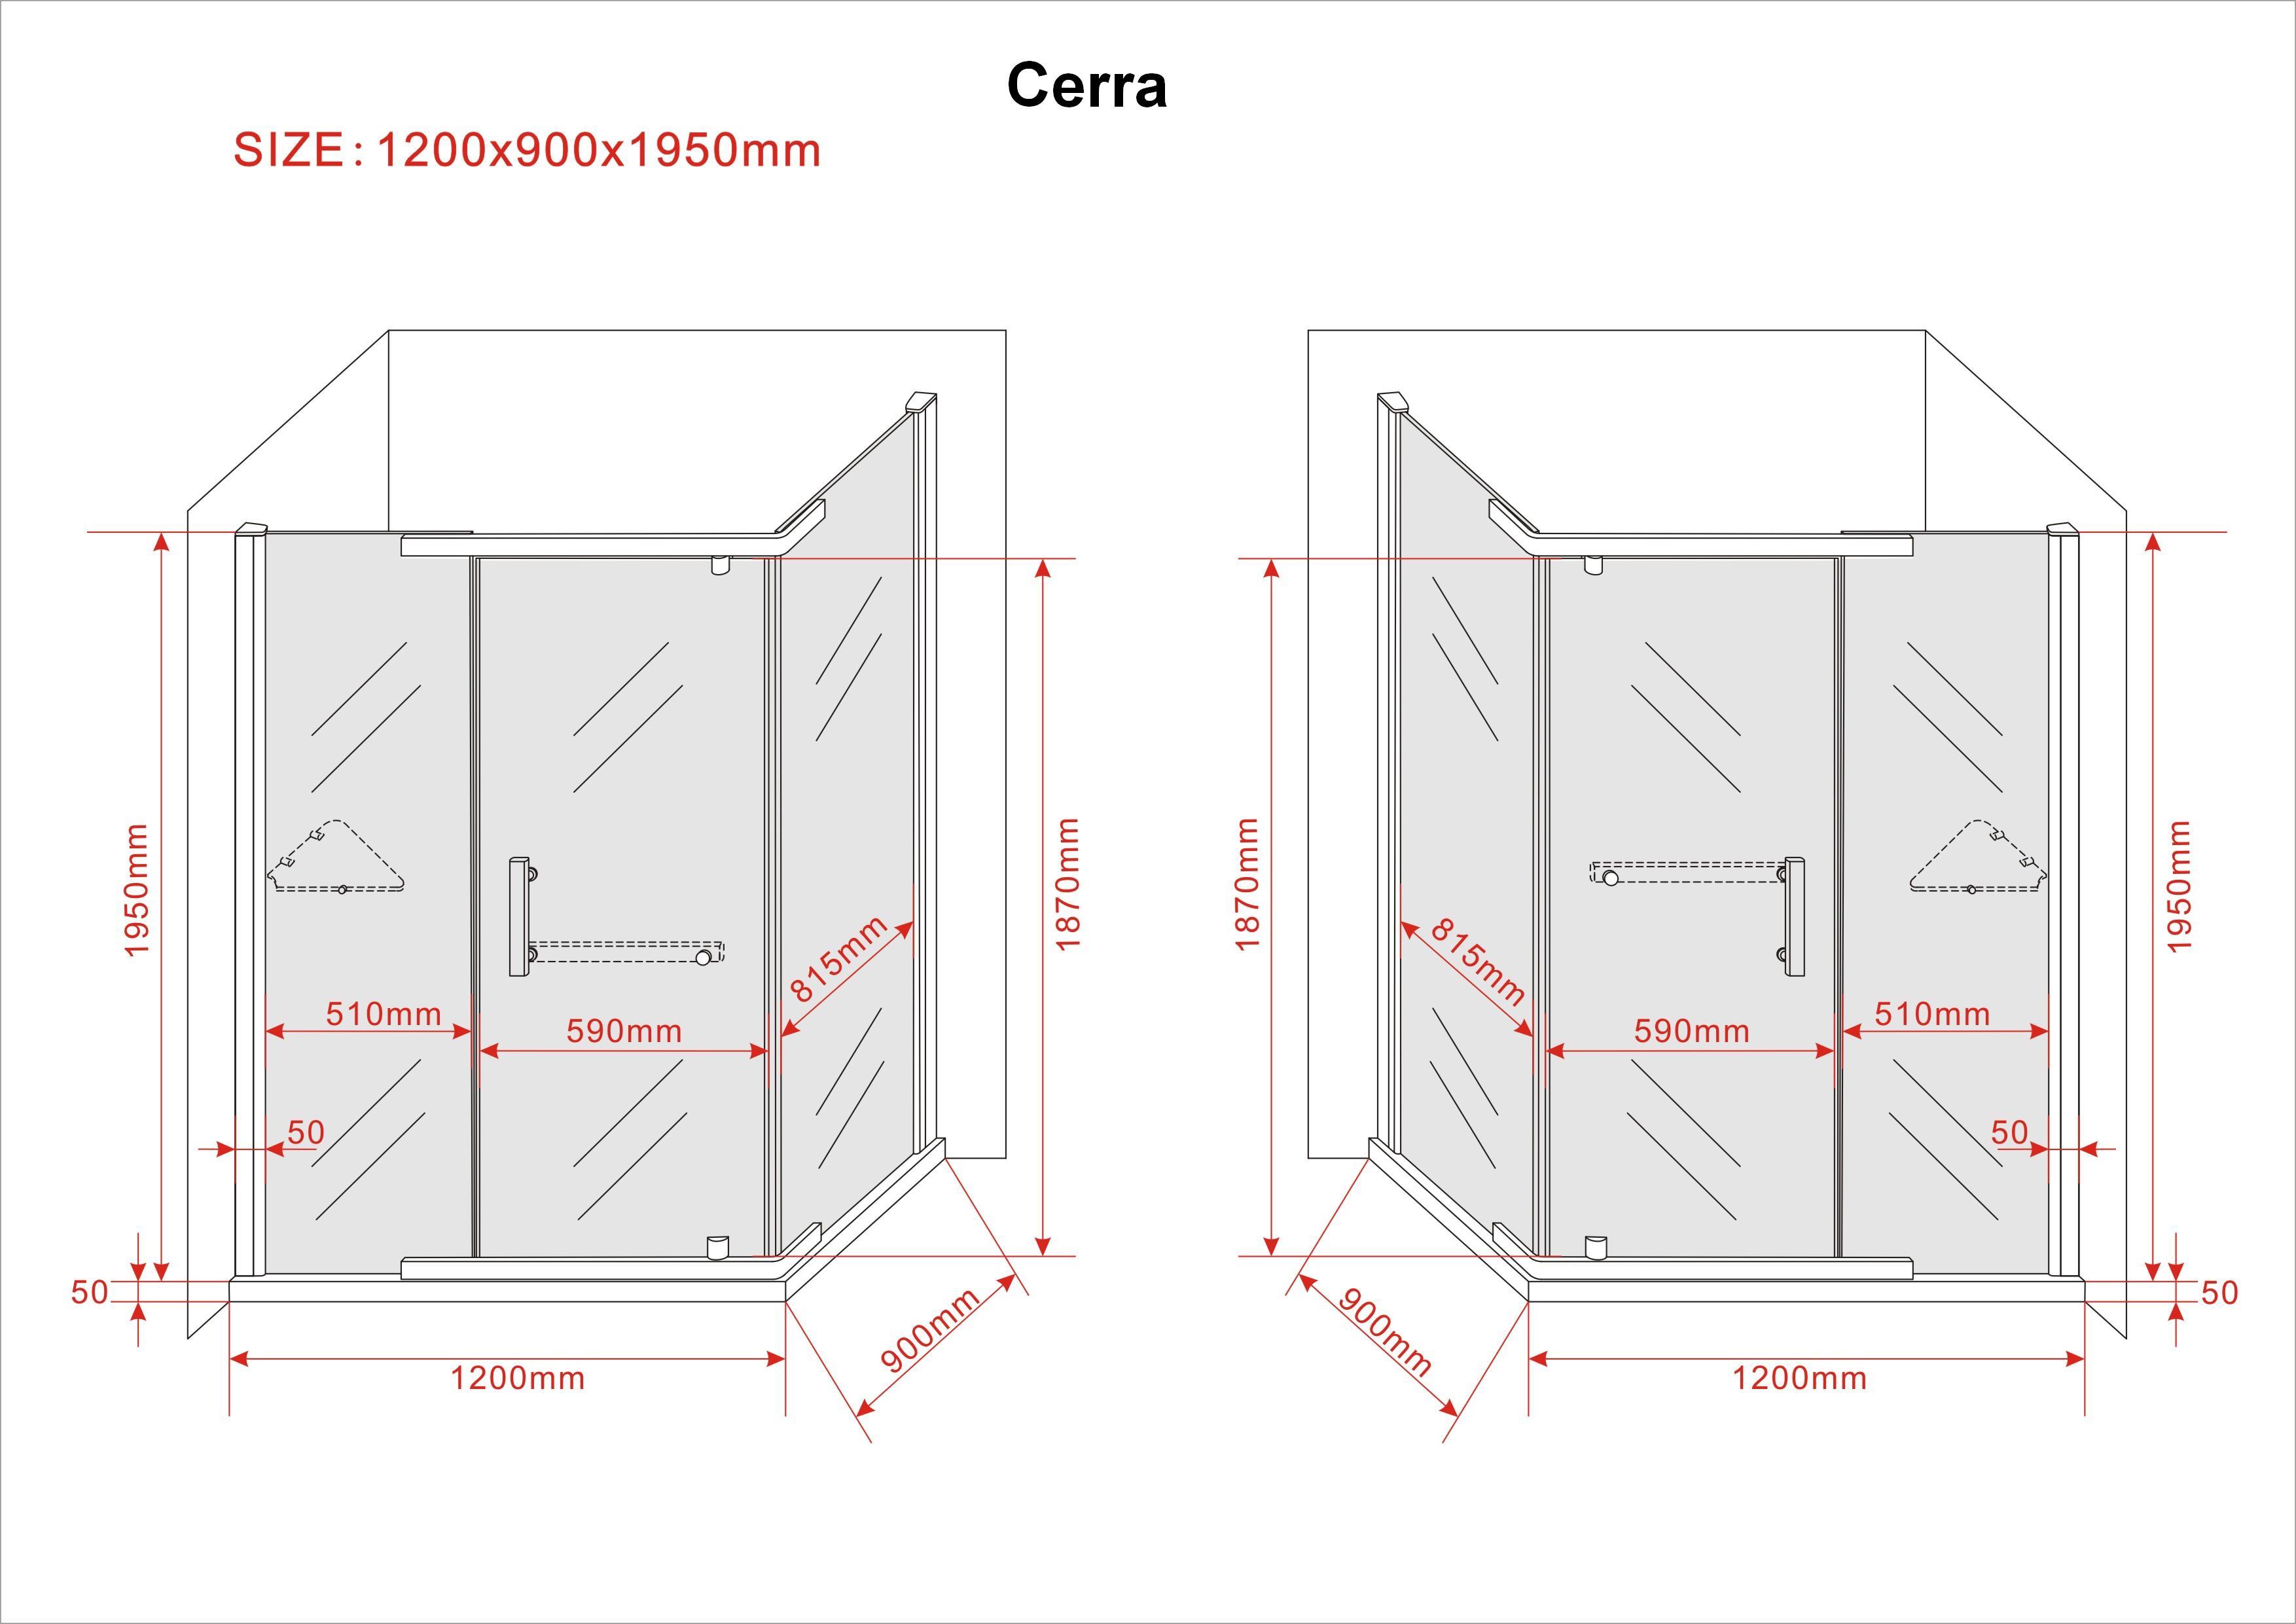 Duschkabine CERRA-FROST 120 x 90 x 200 cm inkl. Duschtasse